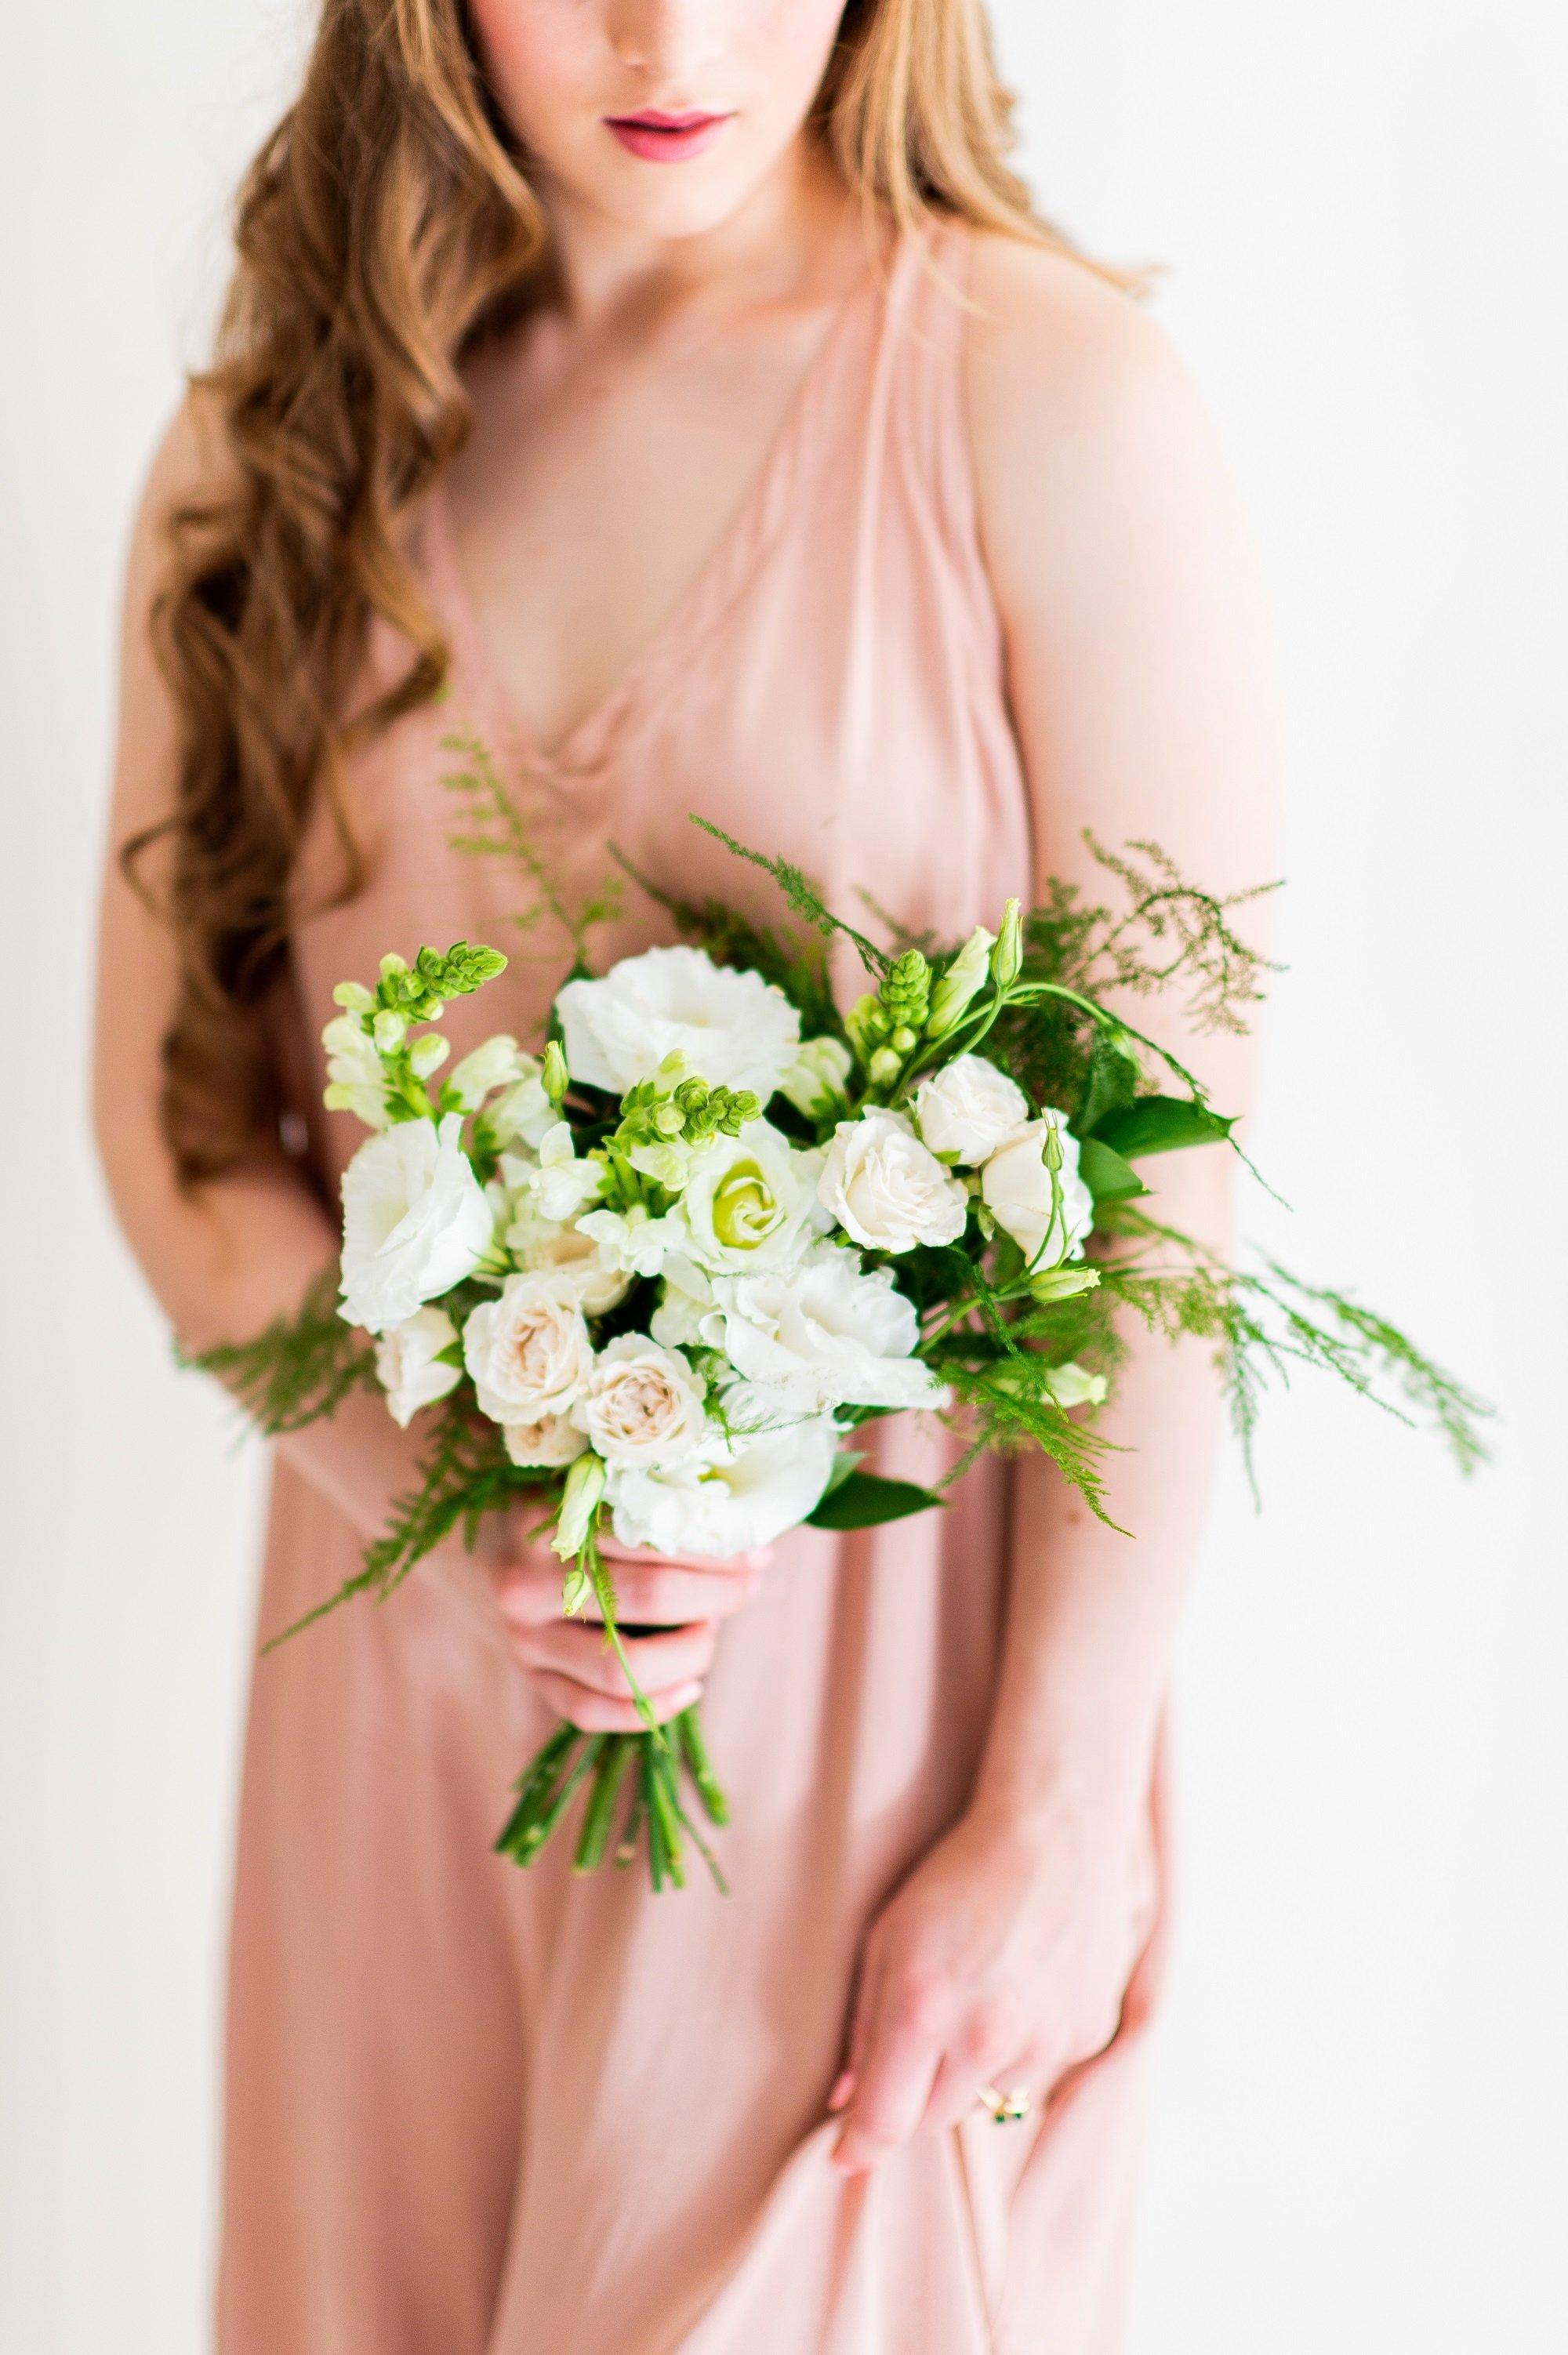 Flower Moxie, DIY Bridesmaid Bouquet, Plumosa Bouquet, fern wedding, cream and green wedding